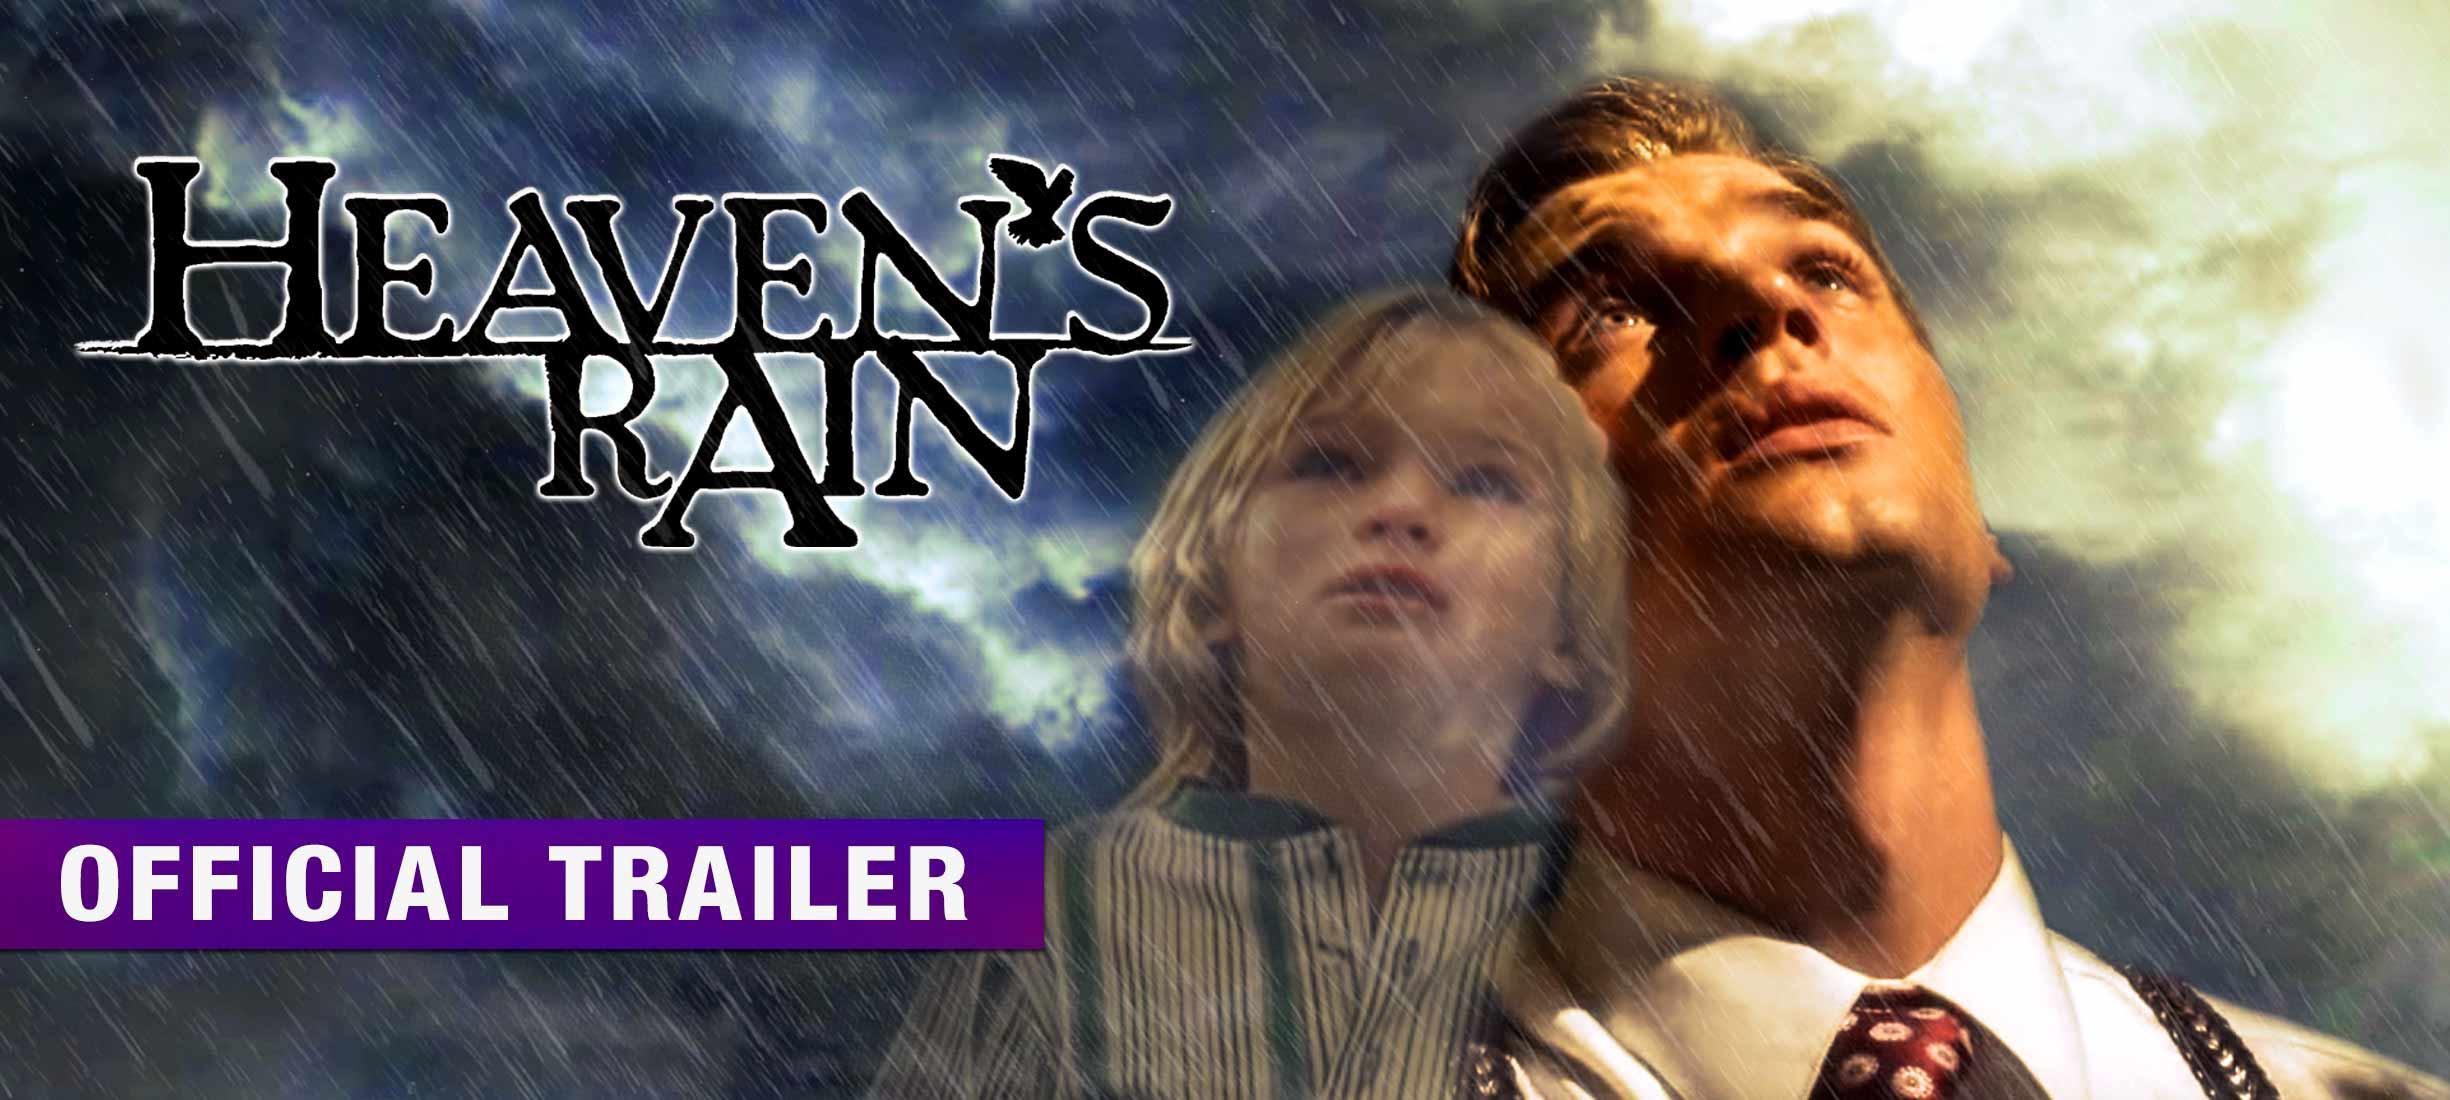 Heaven's Rain: Trailer